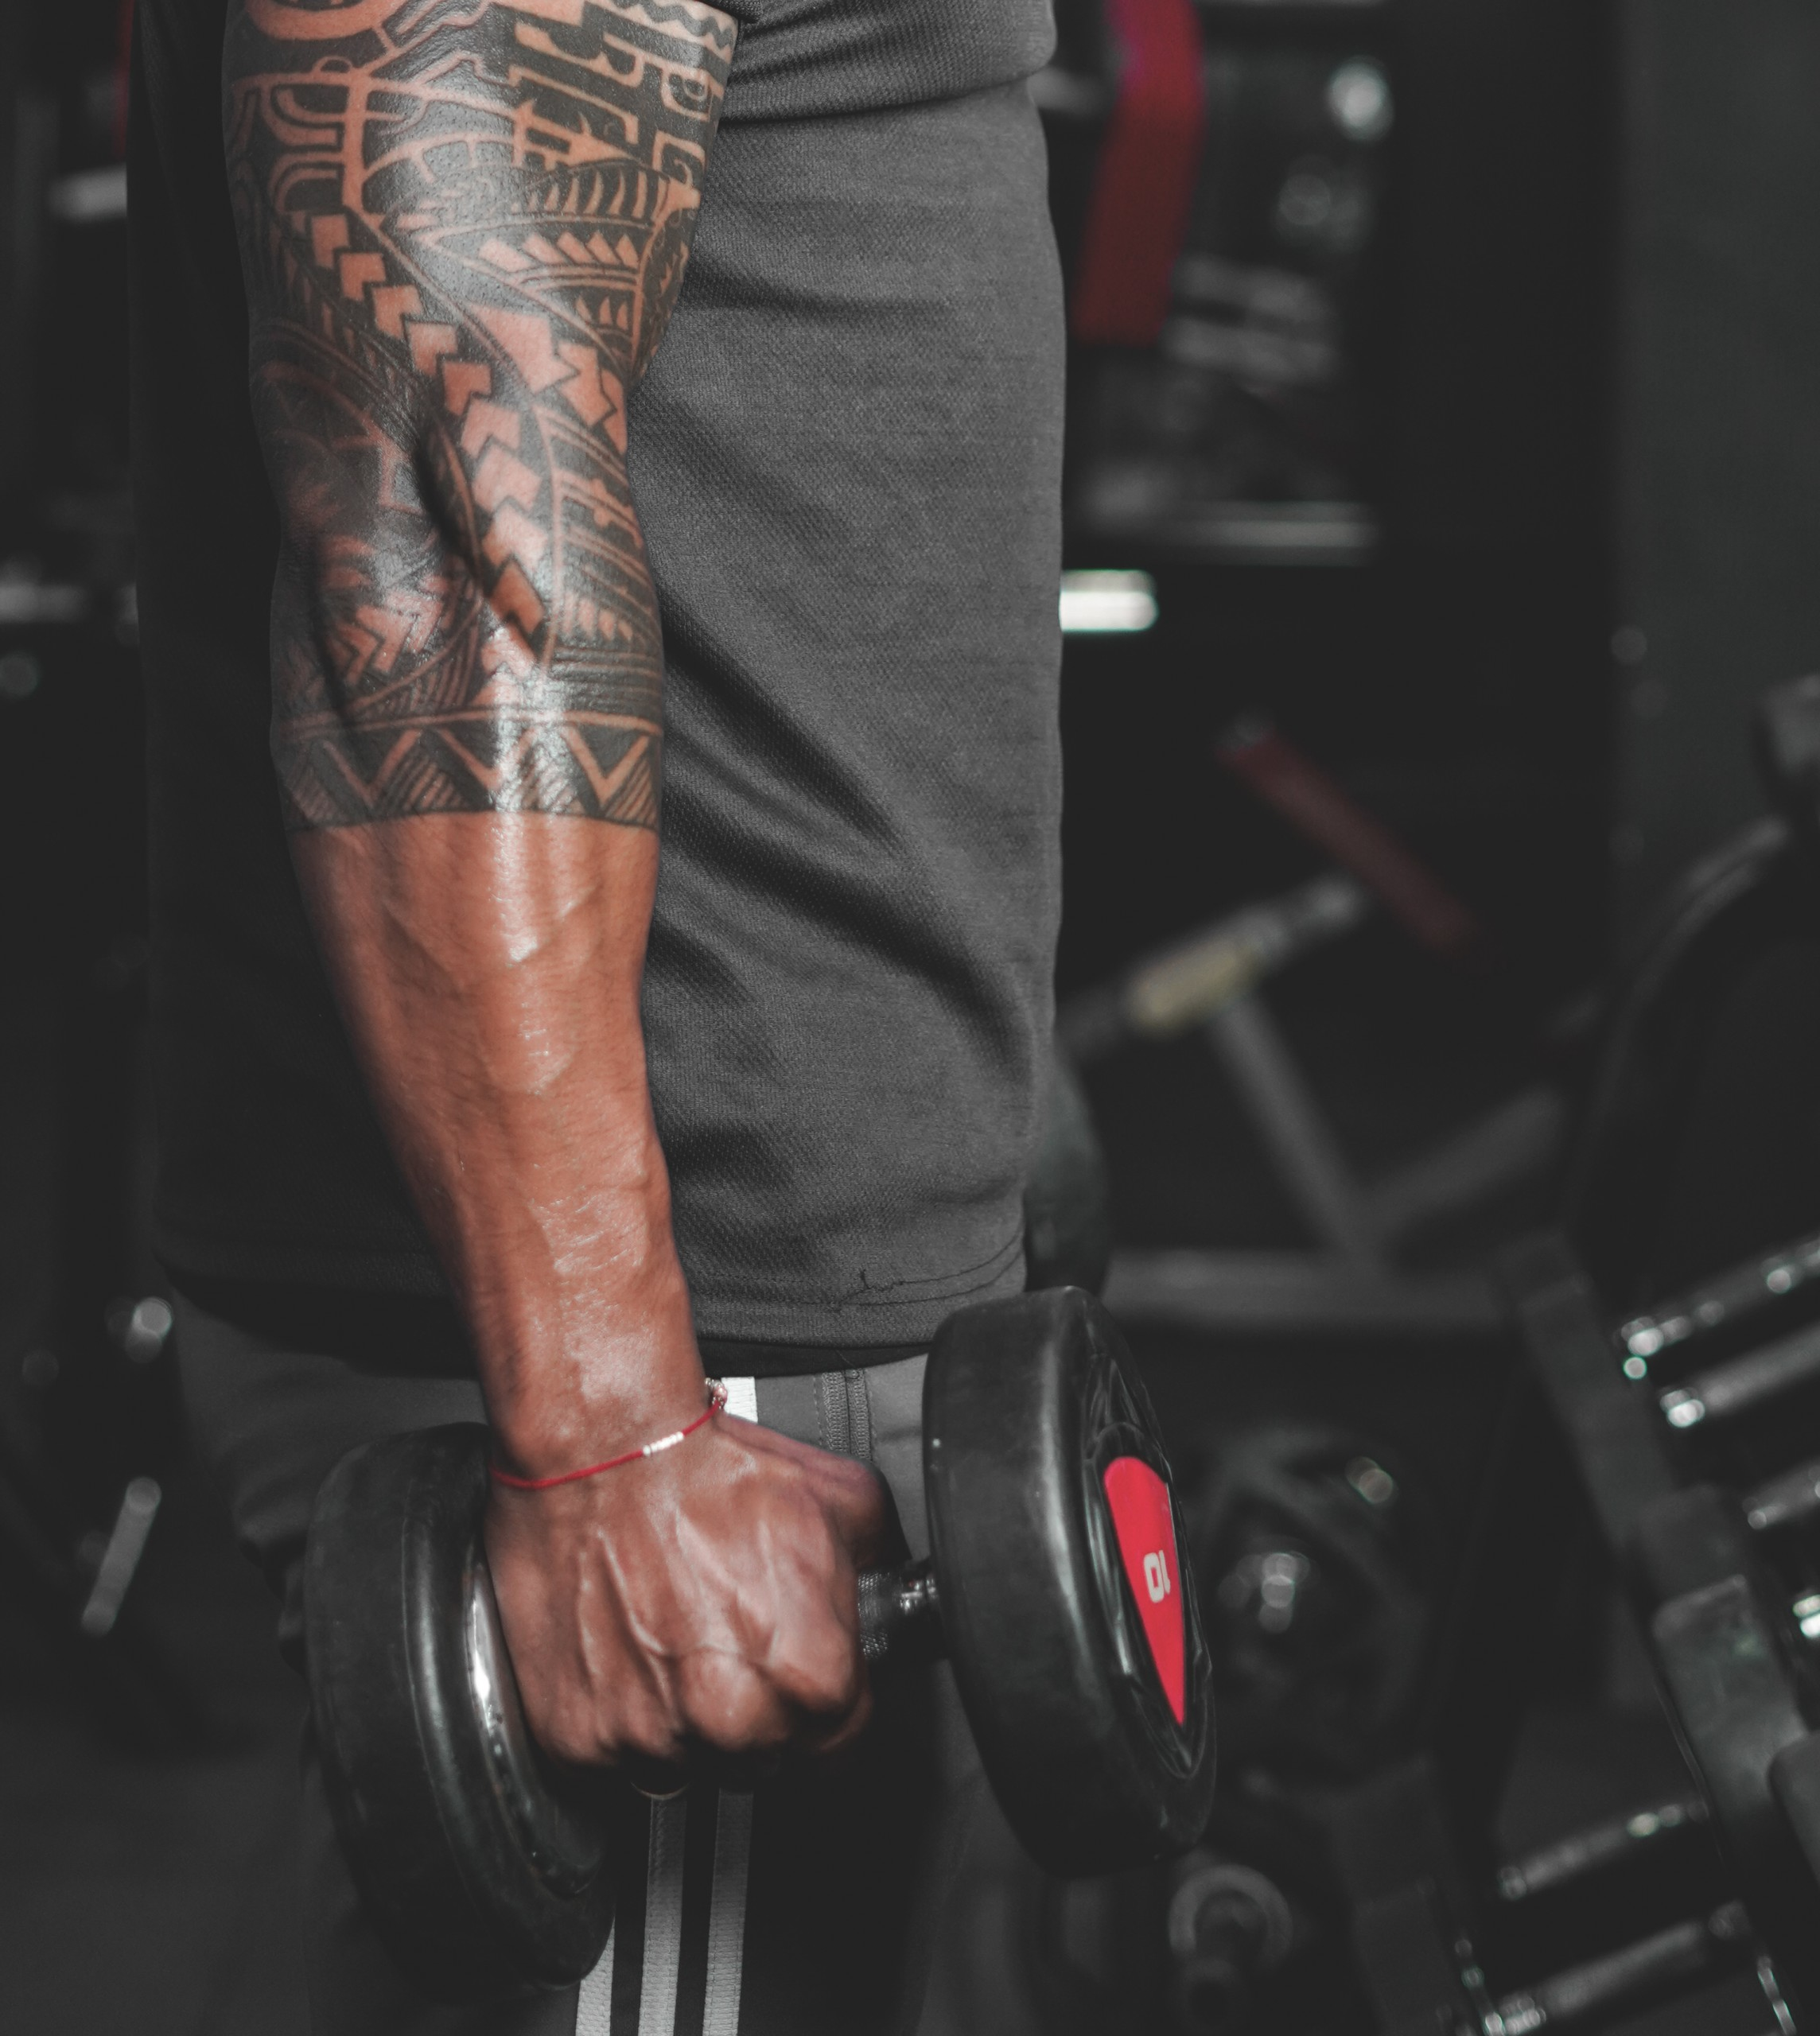 Tattooed Athlete lifting Dumbbells